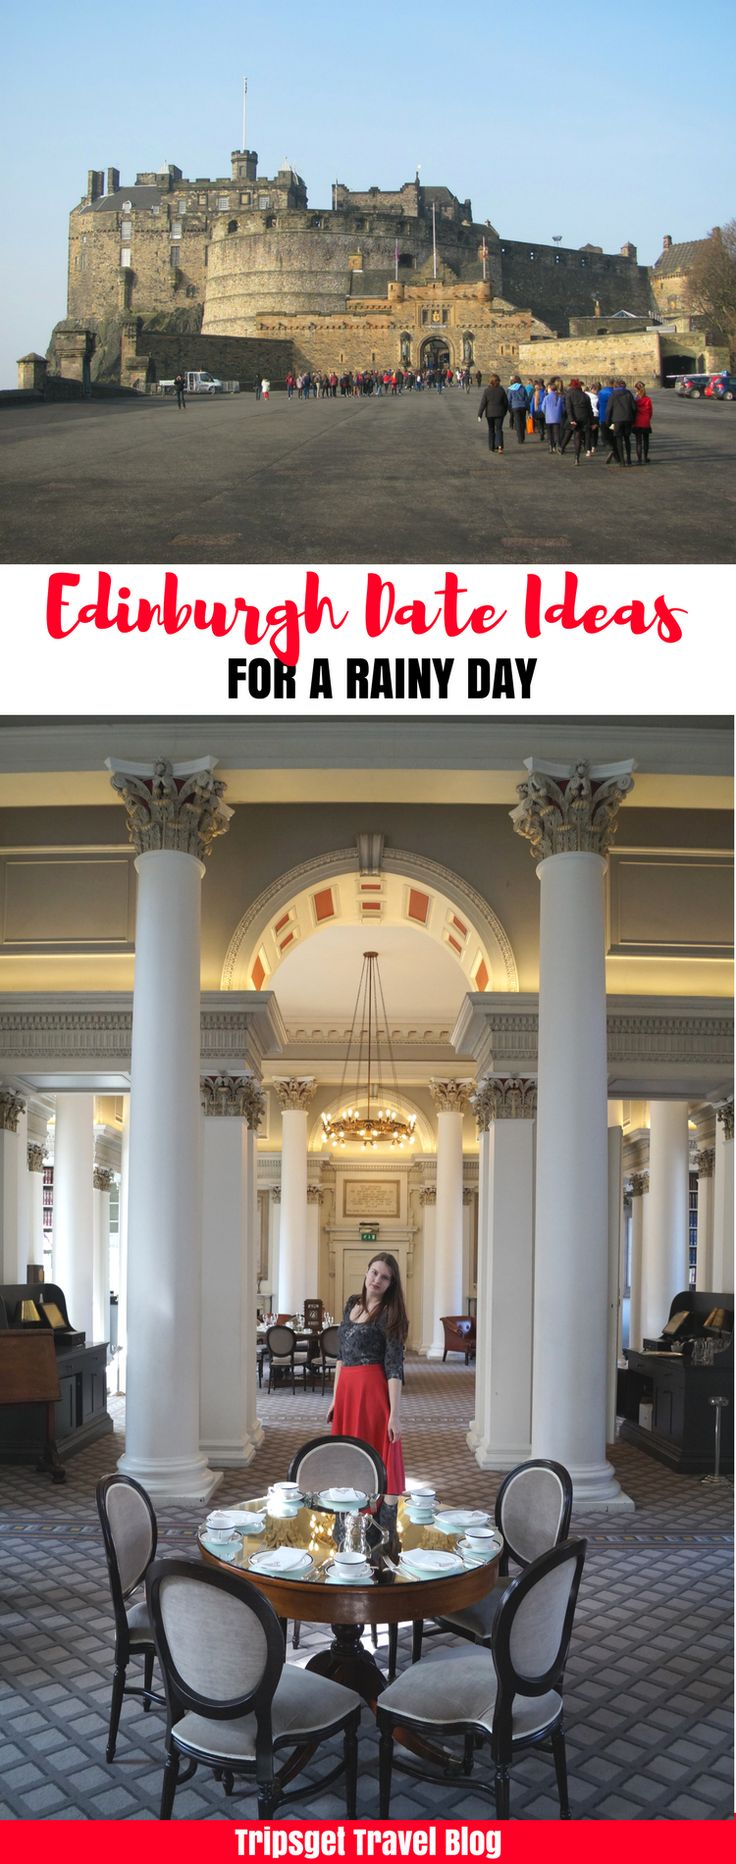 Rainy day date ideas in Brisbane